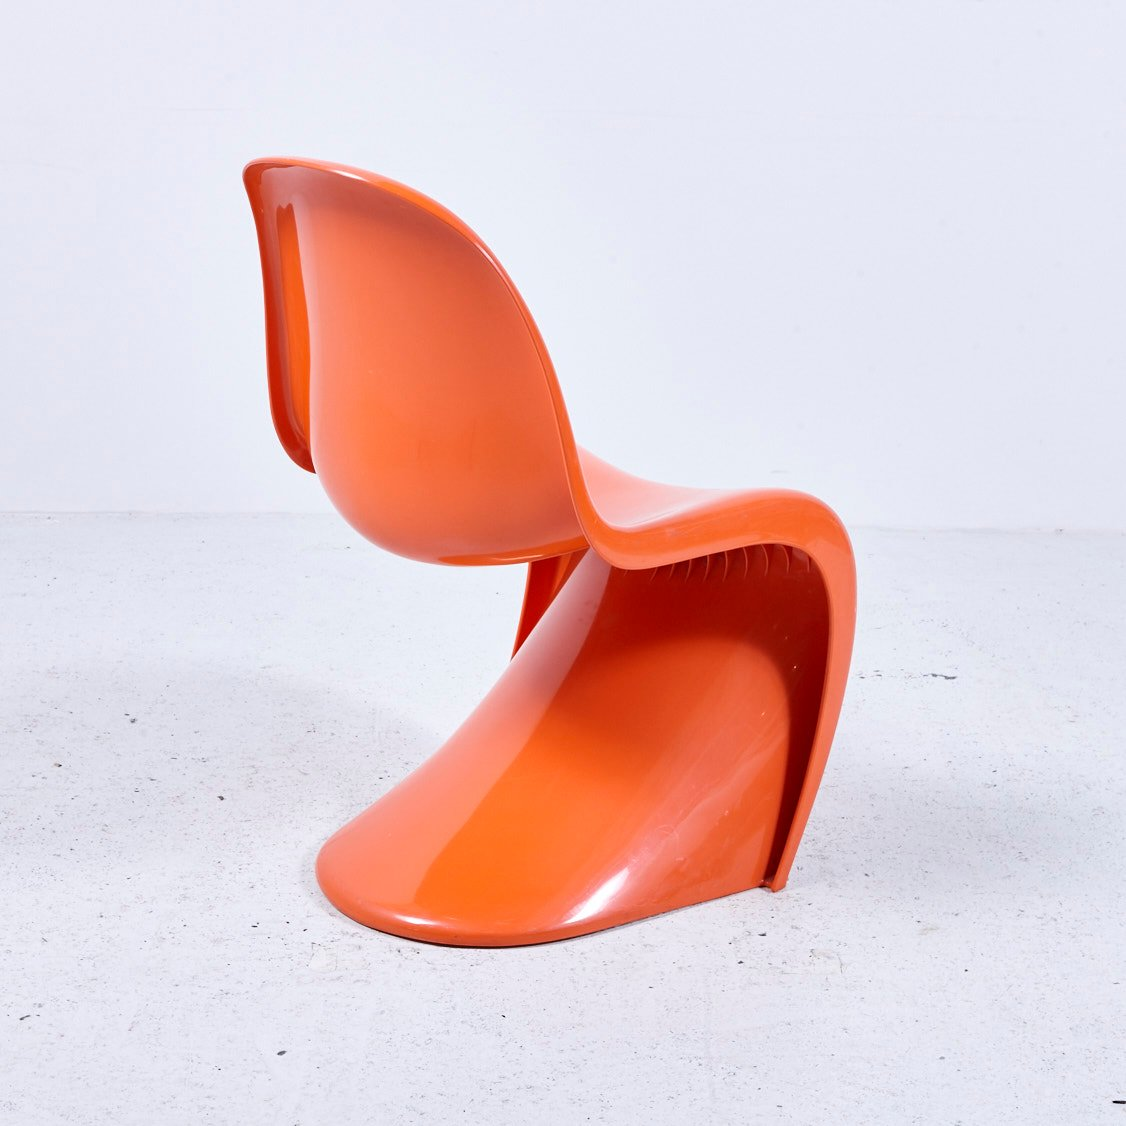 ... Orange Panton Chair By Verner Panton For Hermann Miller ...